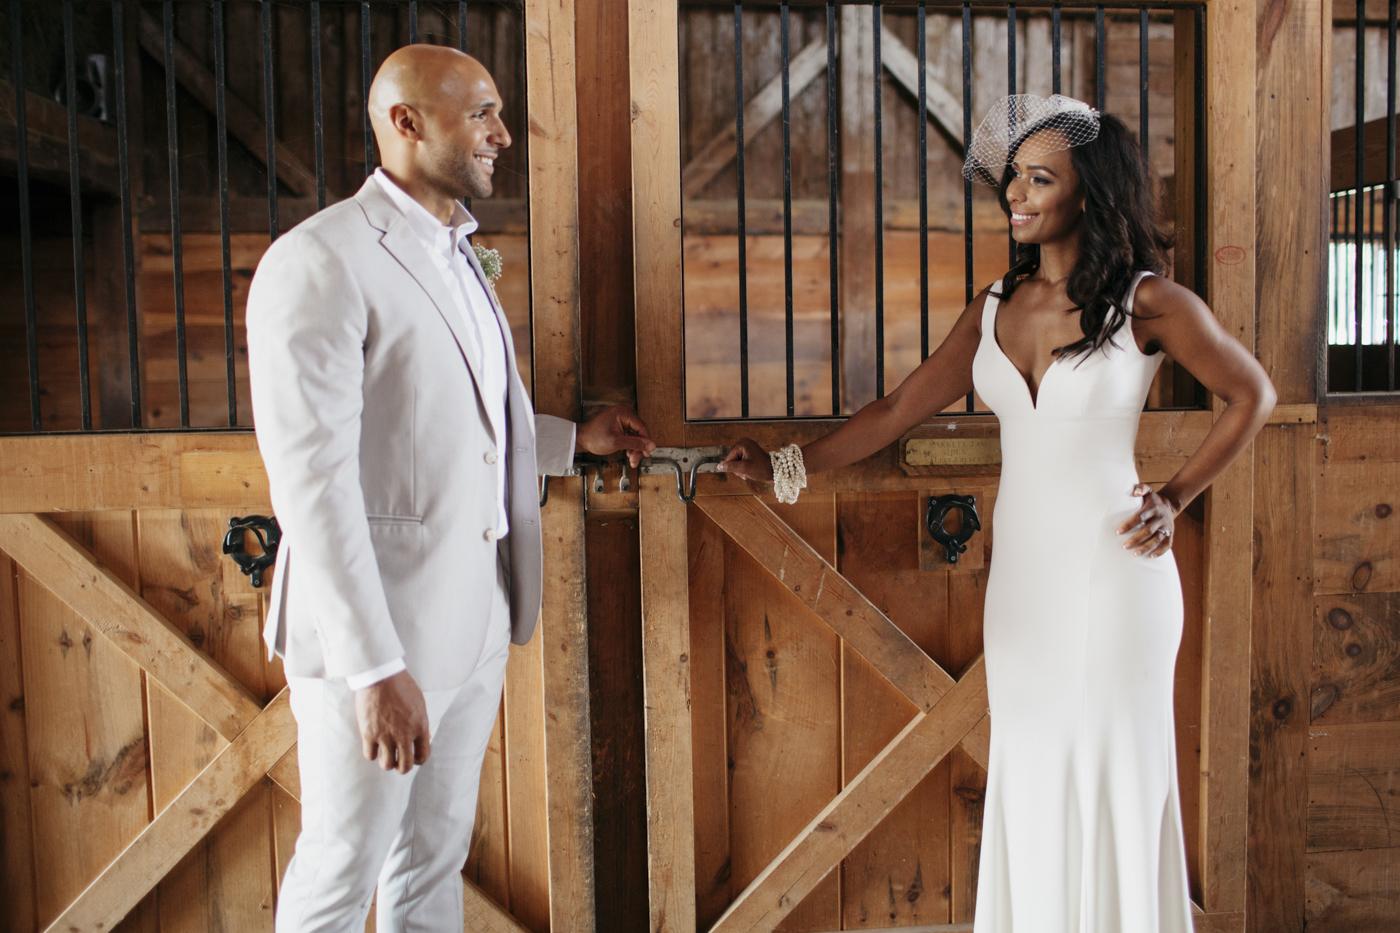 Toni_Earl_Rest_and_Be_Thankful_farm_wedding_maine_013.jpg